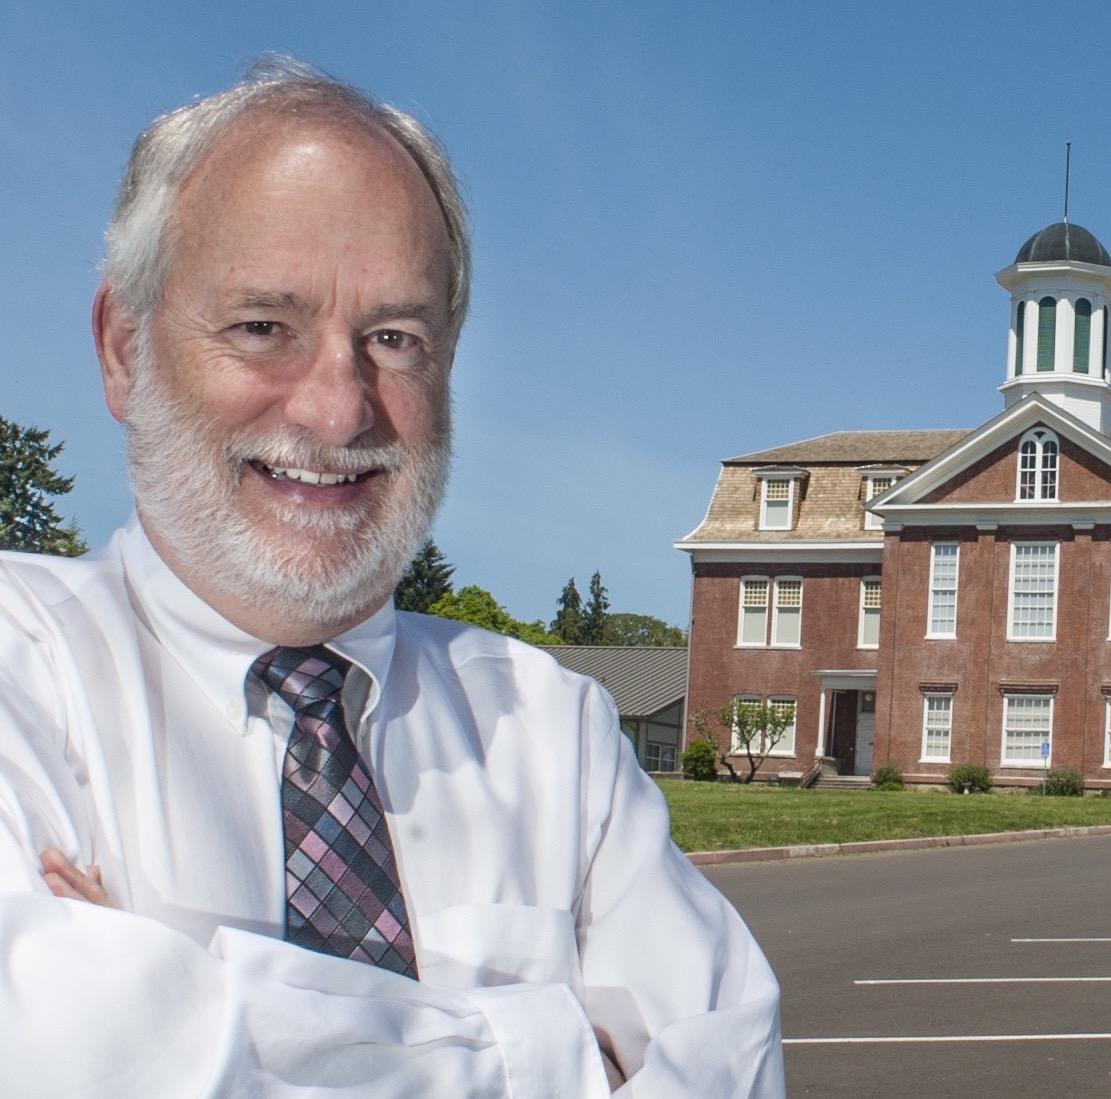 David R. Grube, MD